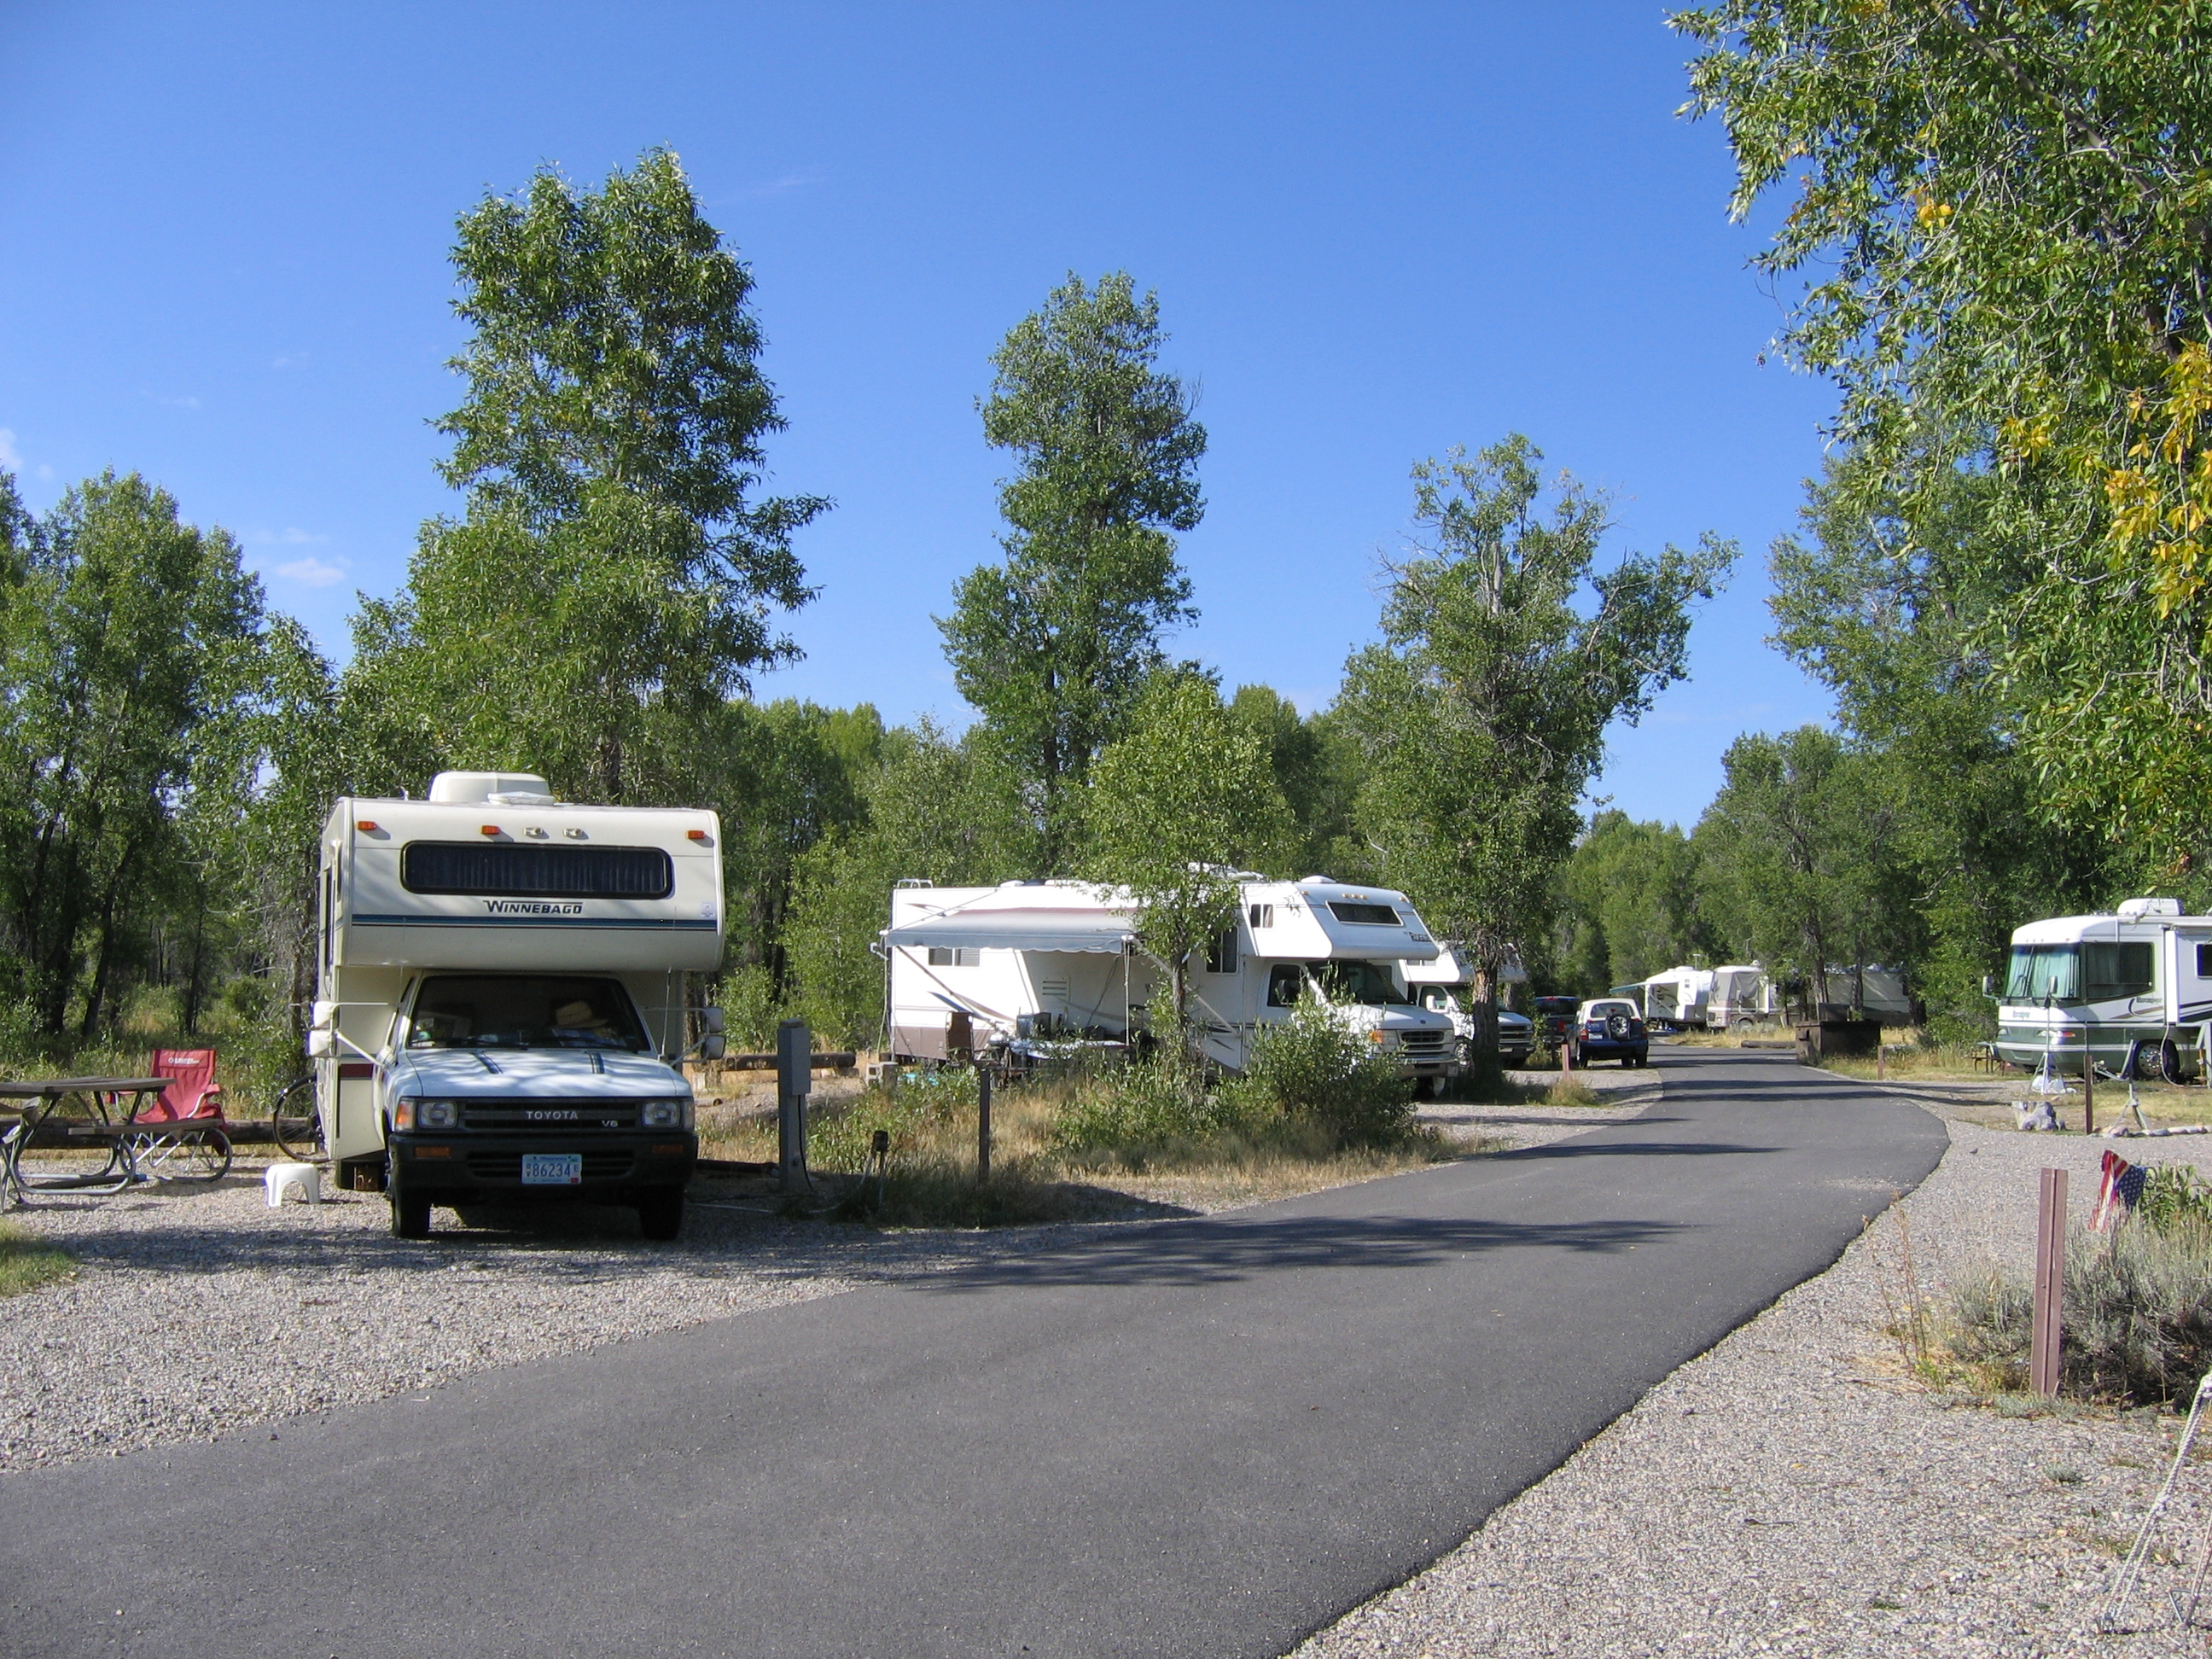 Full uppkoppling camping i wyoming.